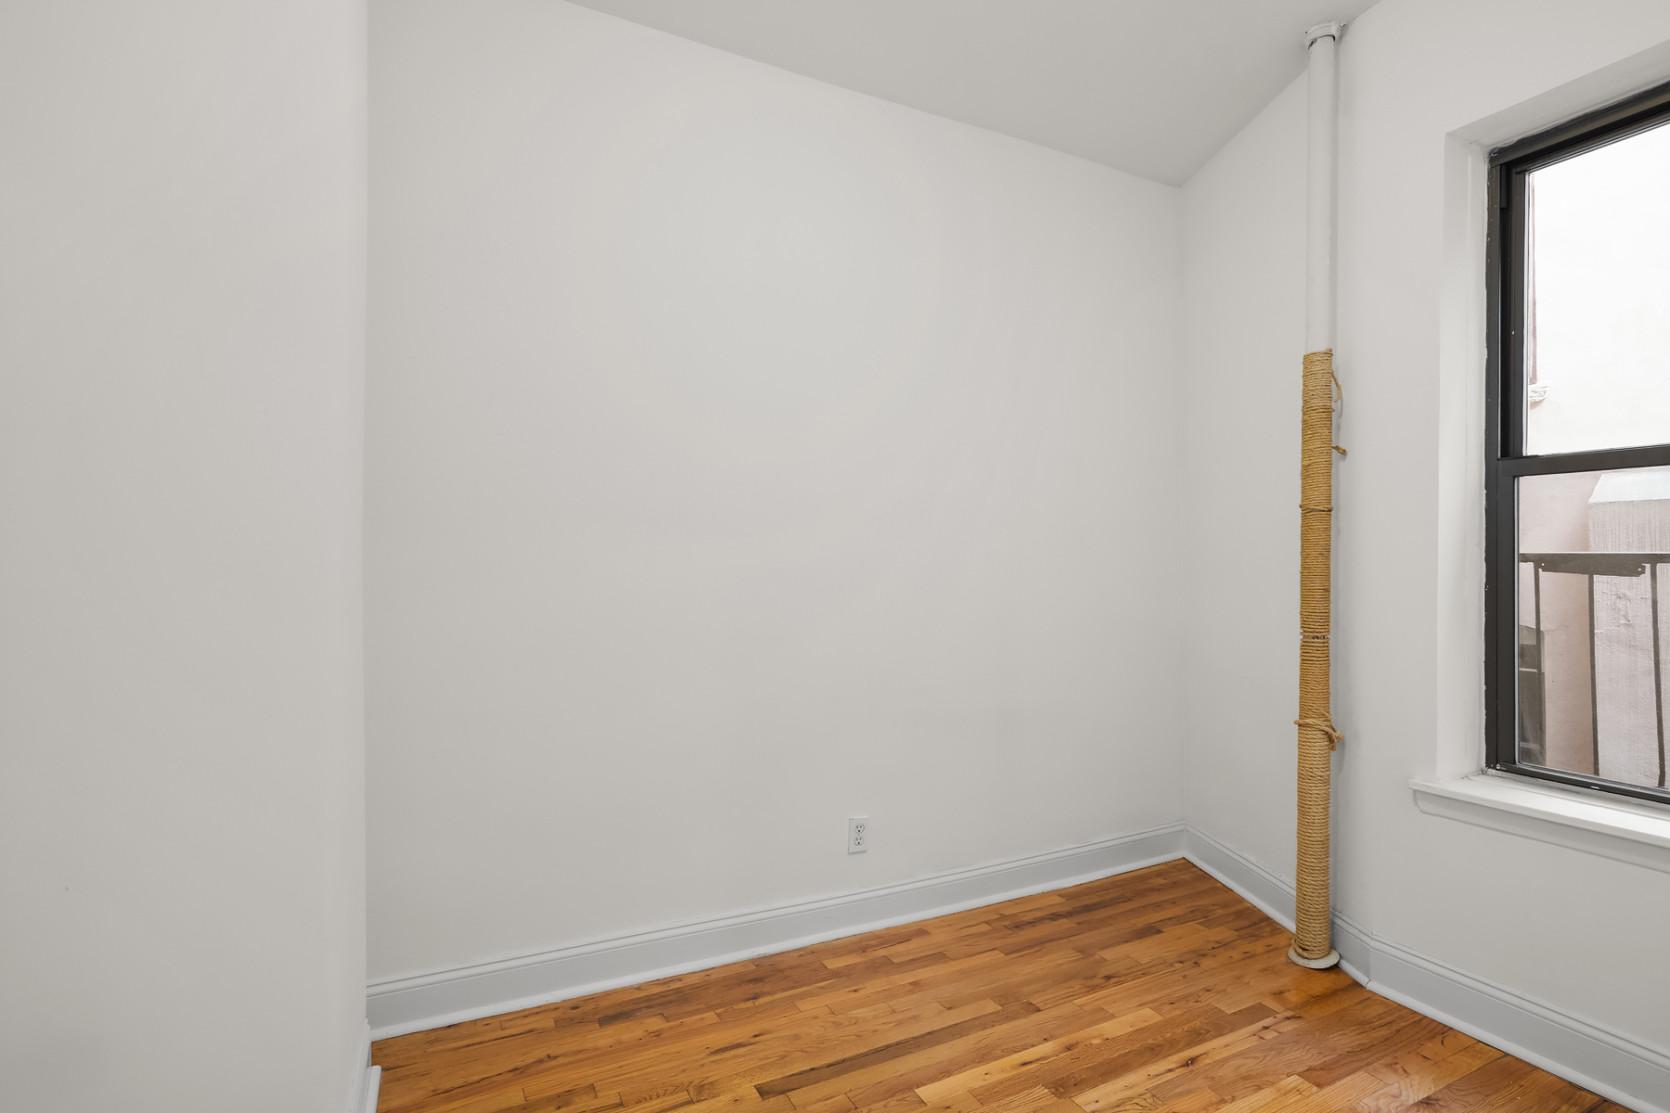 hardwood floor repair queens ny of gavin hammon real estate agent in new york city compass regarding f5772fdca553b74083a4ad5e961c976b9cd5378c